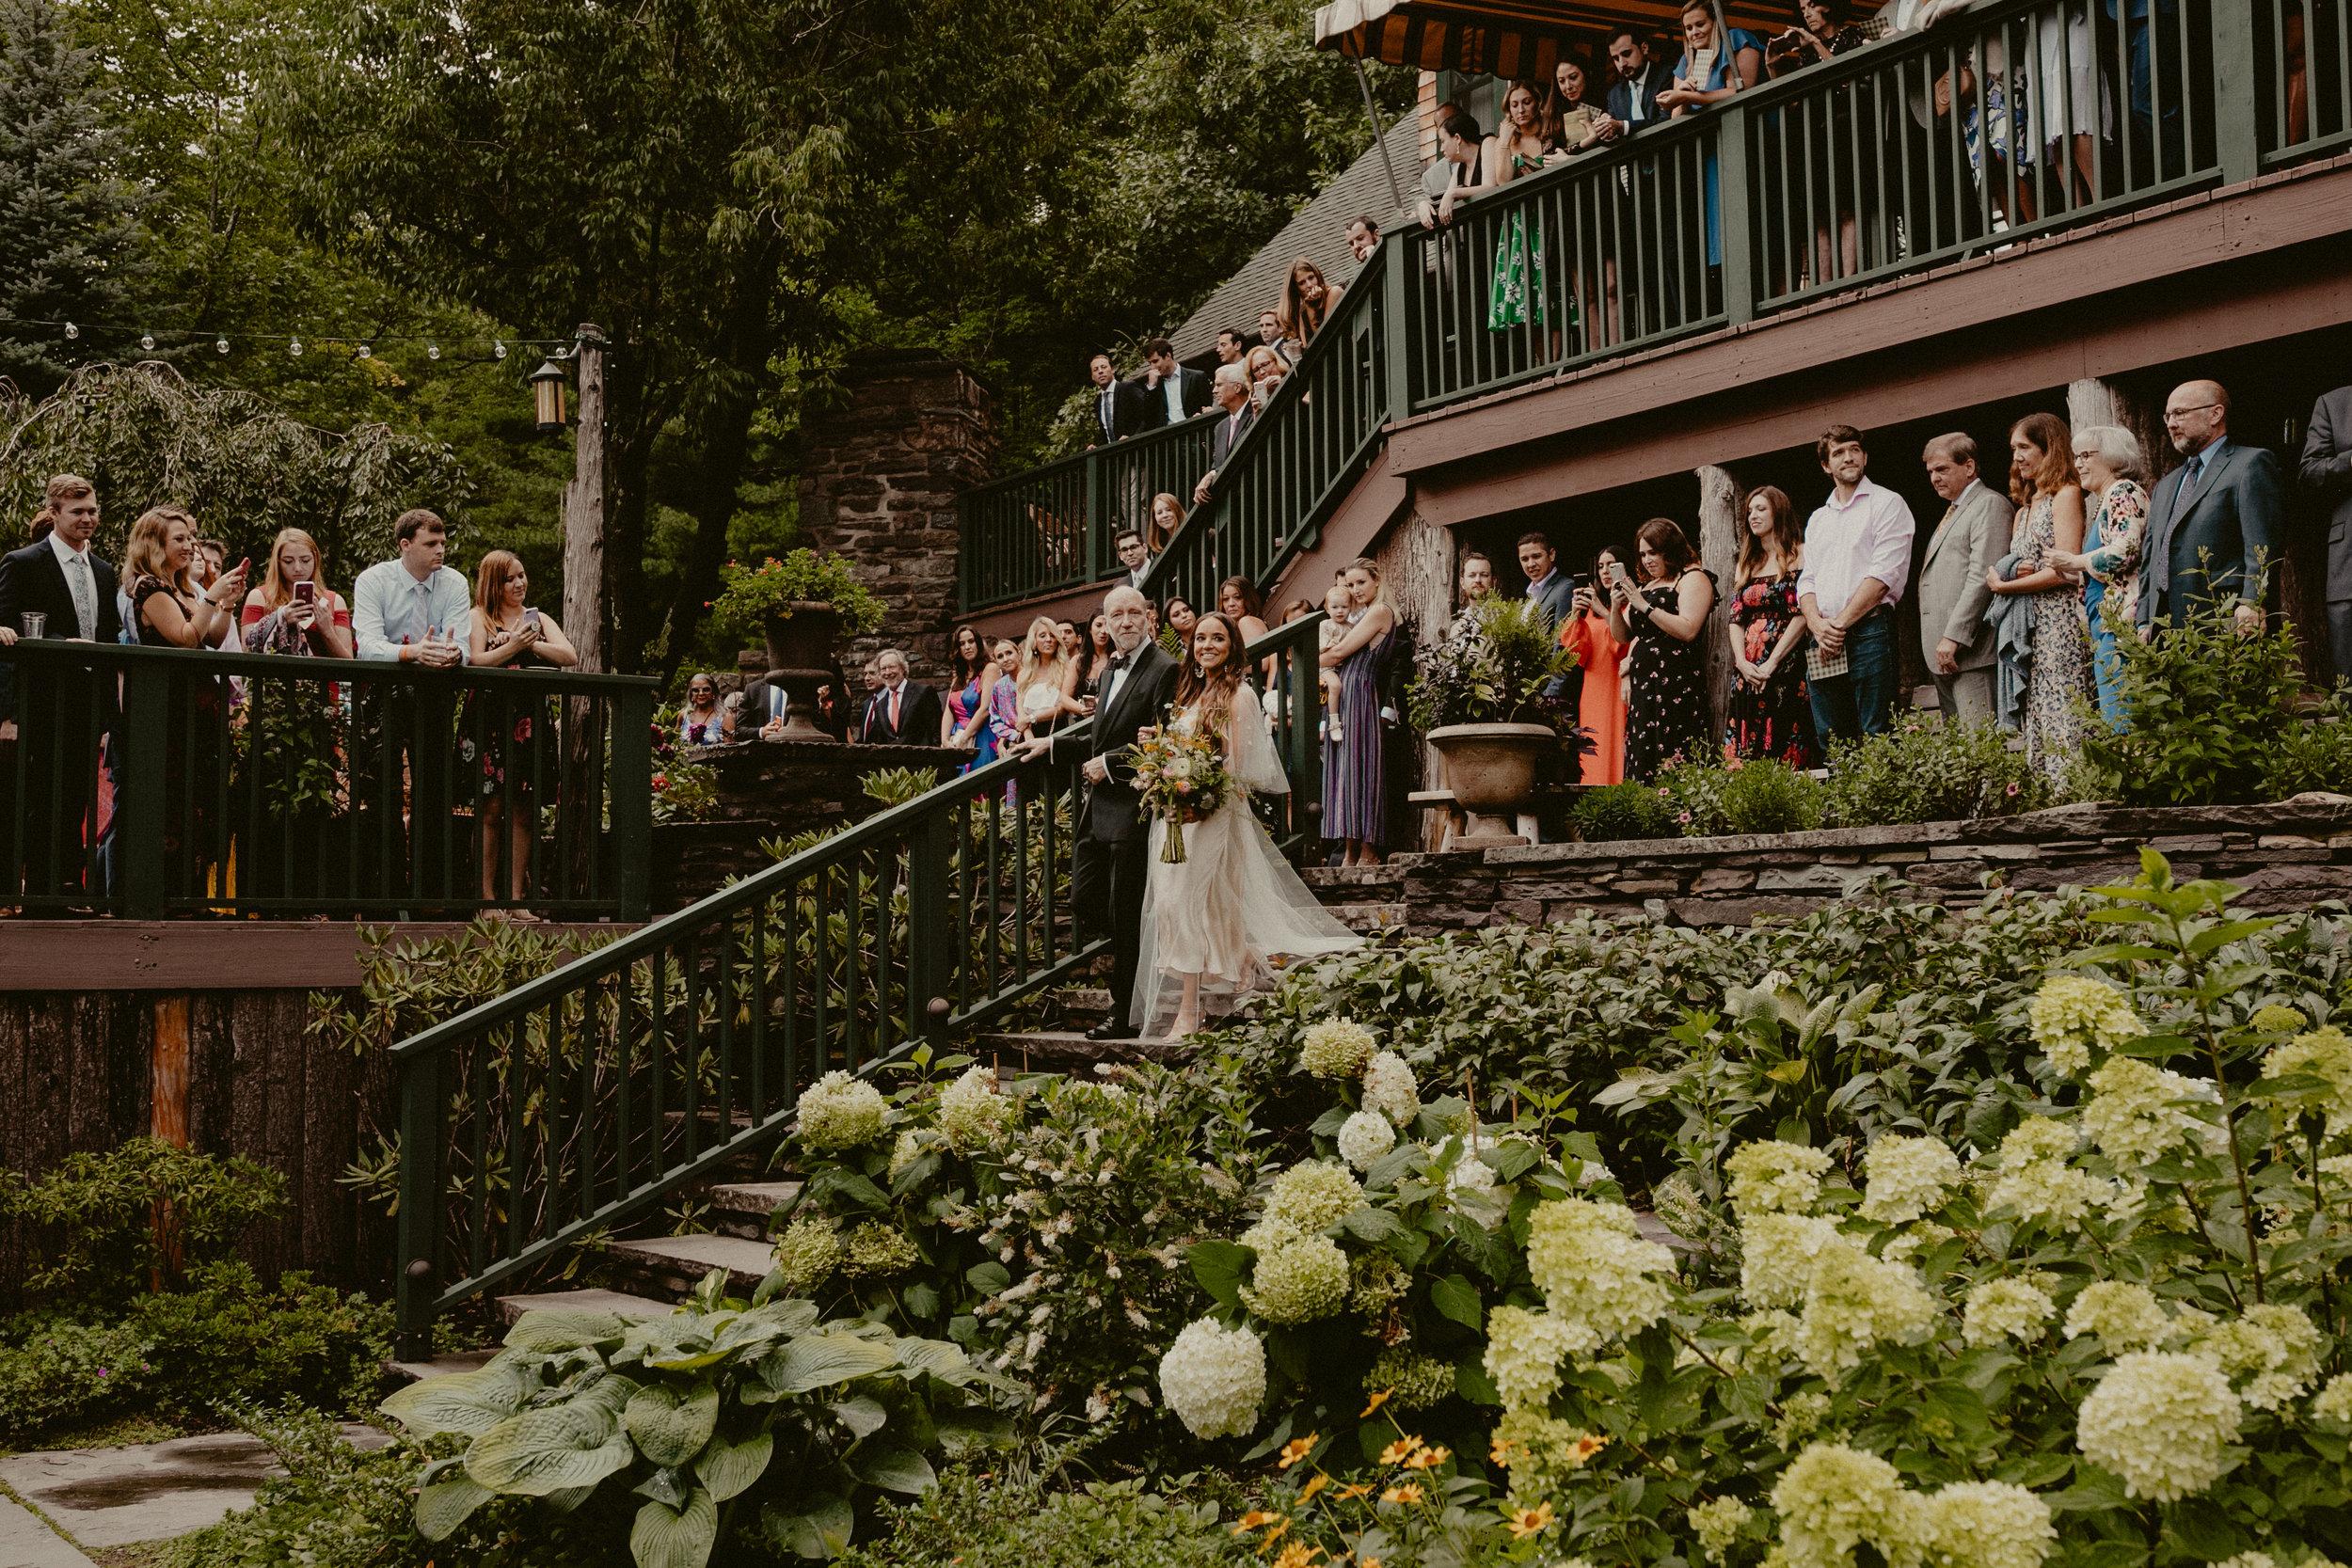 DEER_MOUNTAIN_INN_WEDDING_CHELLISE_MICHAEL_PHOTOGRAPHY-1345.jpg